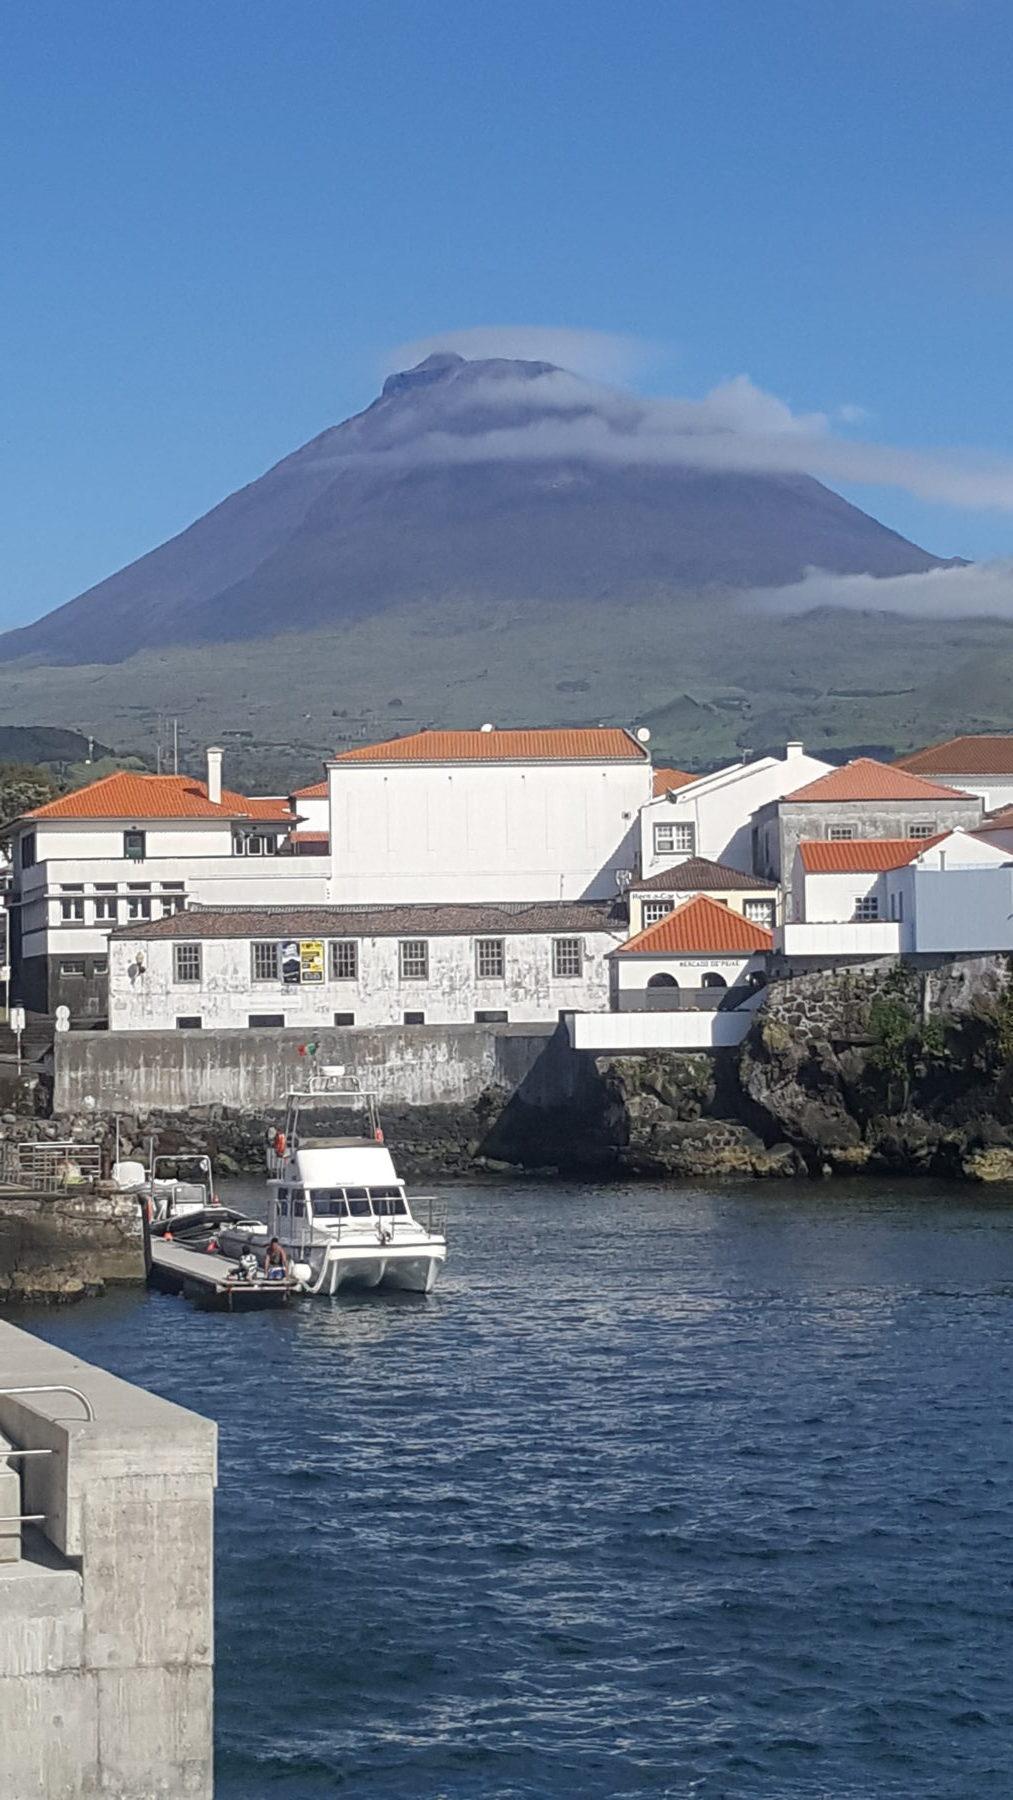 Pico island